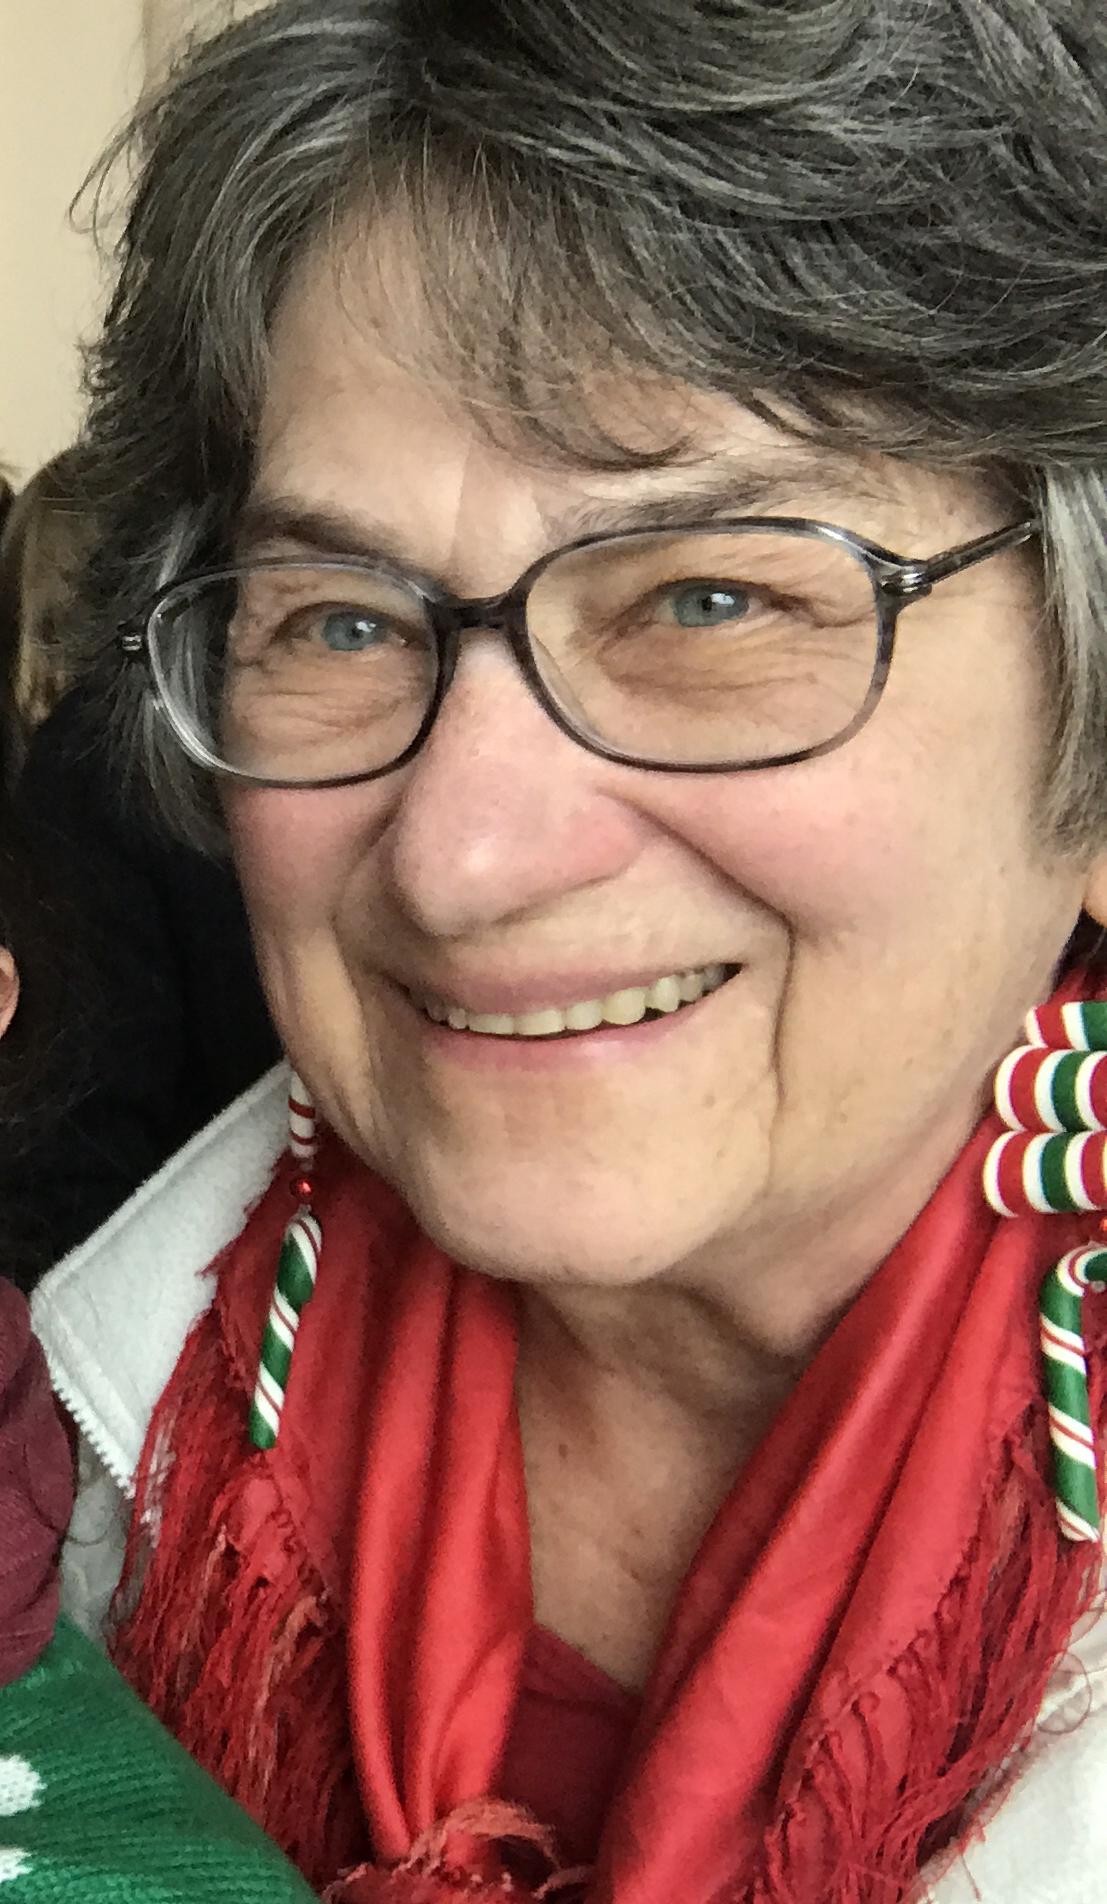 Susan Oleszko   Science teacher, seamstress, and quiltmaker, Susan lives in Georgetown Massachusetts.